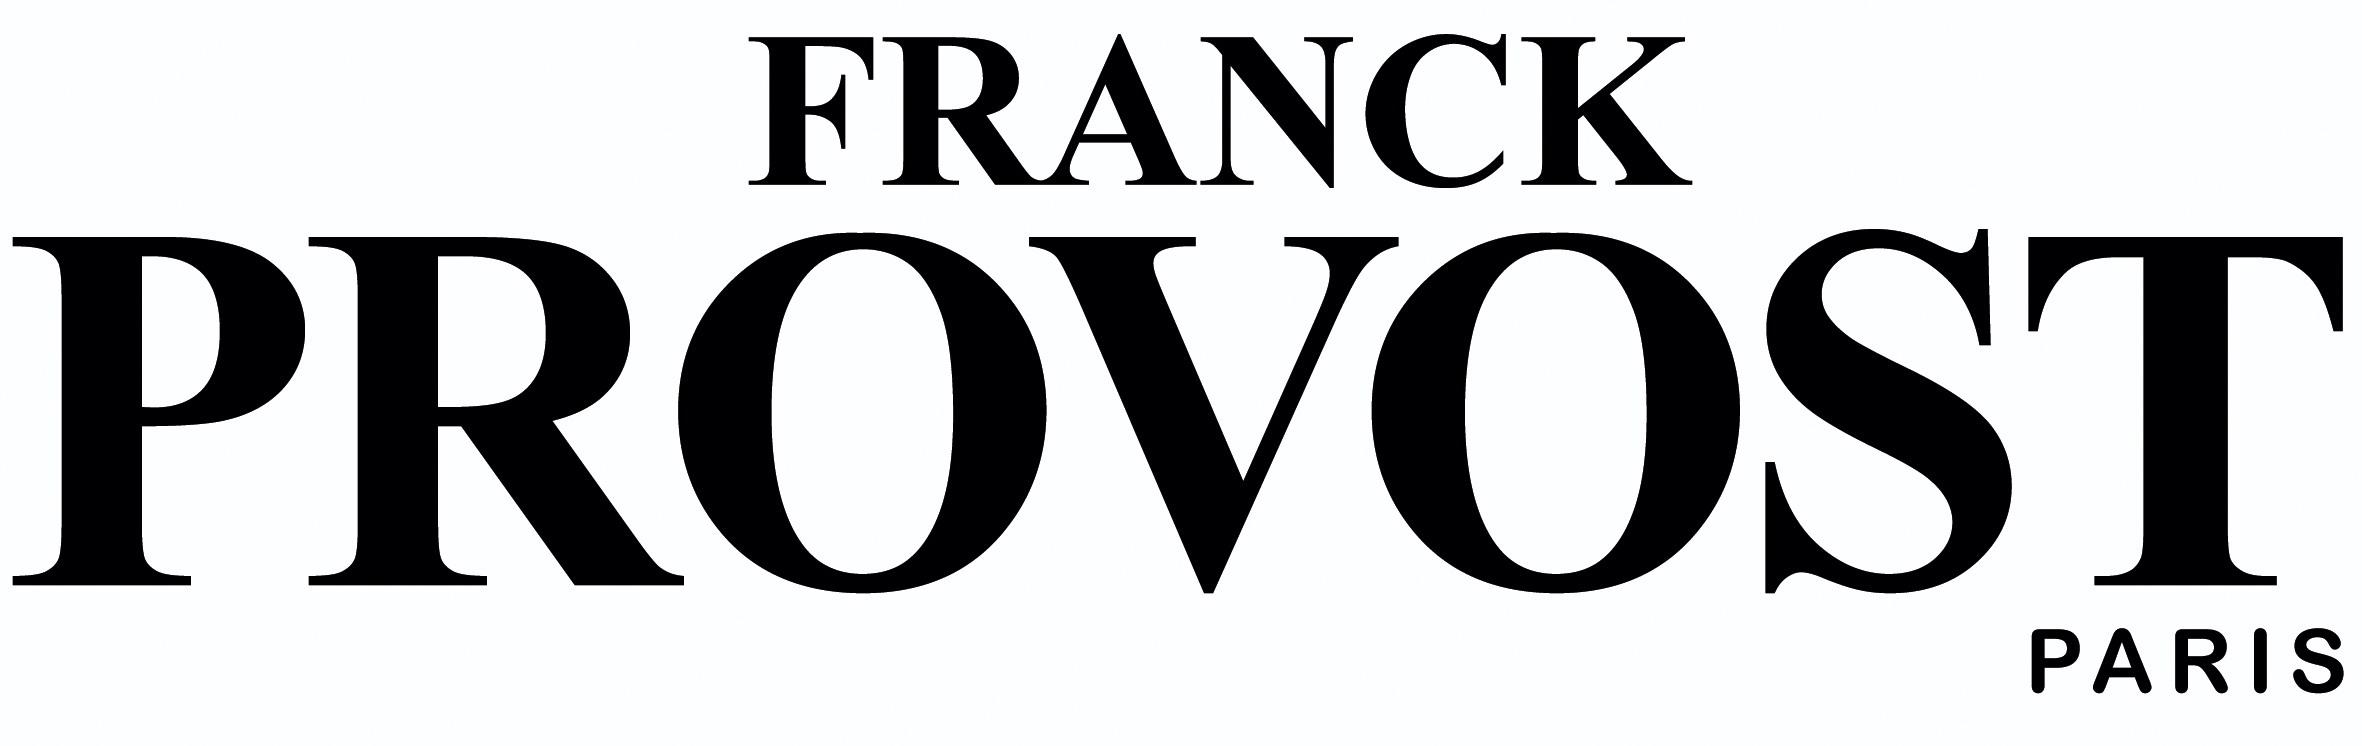 Franck Provost - Salon-de-Provence